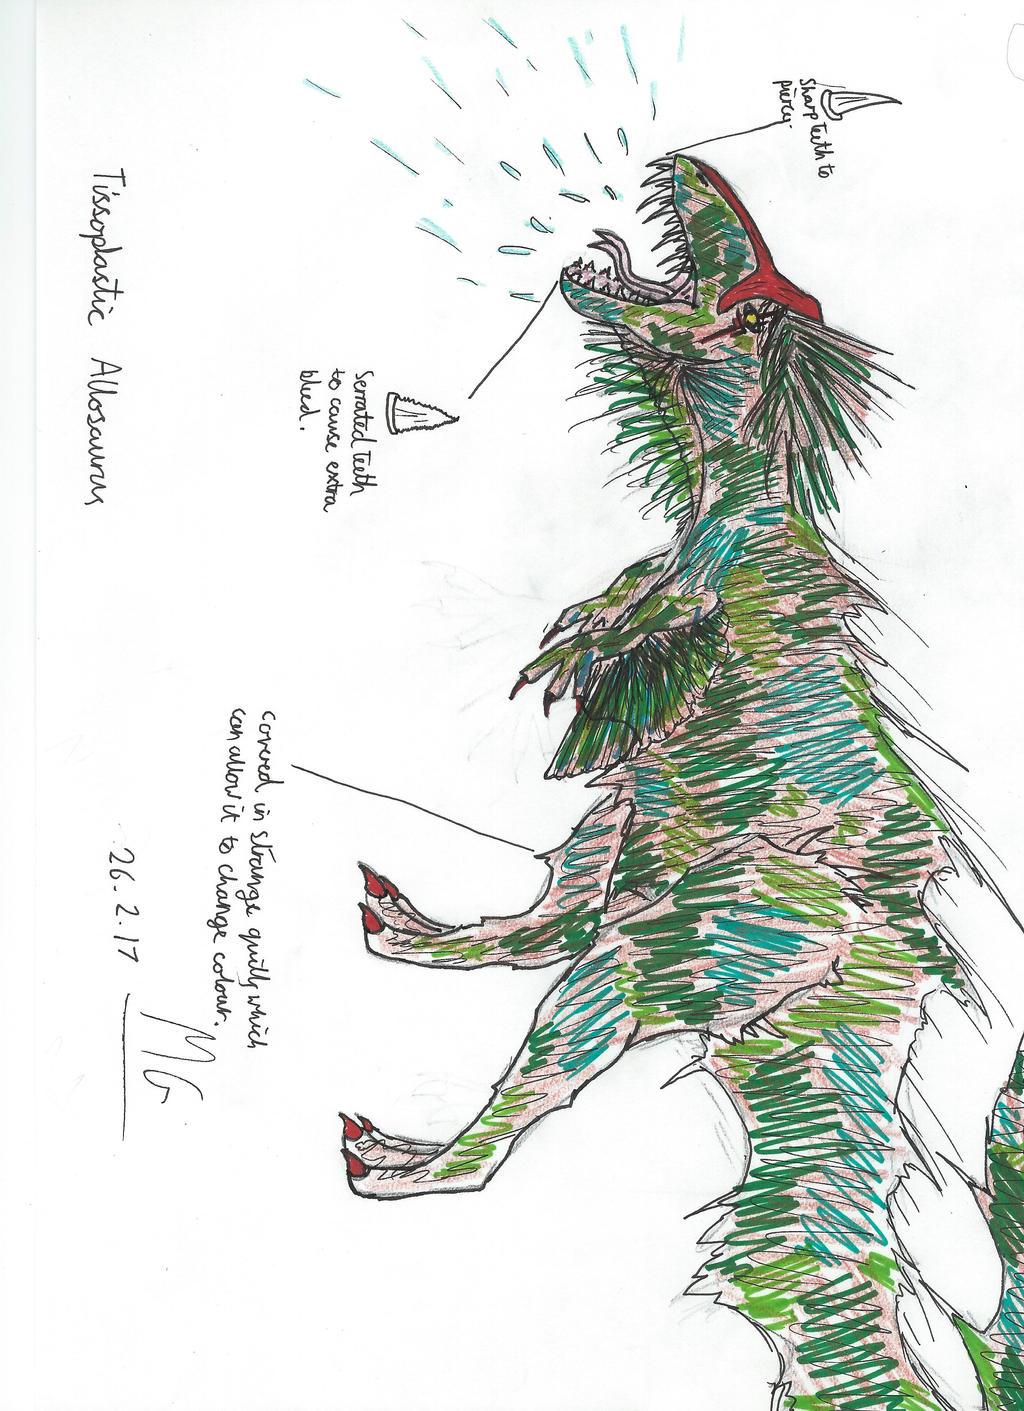 Tissoplastic Allosaurus by Mgcroco